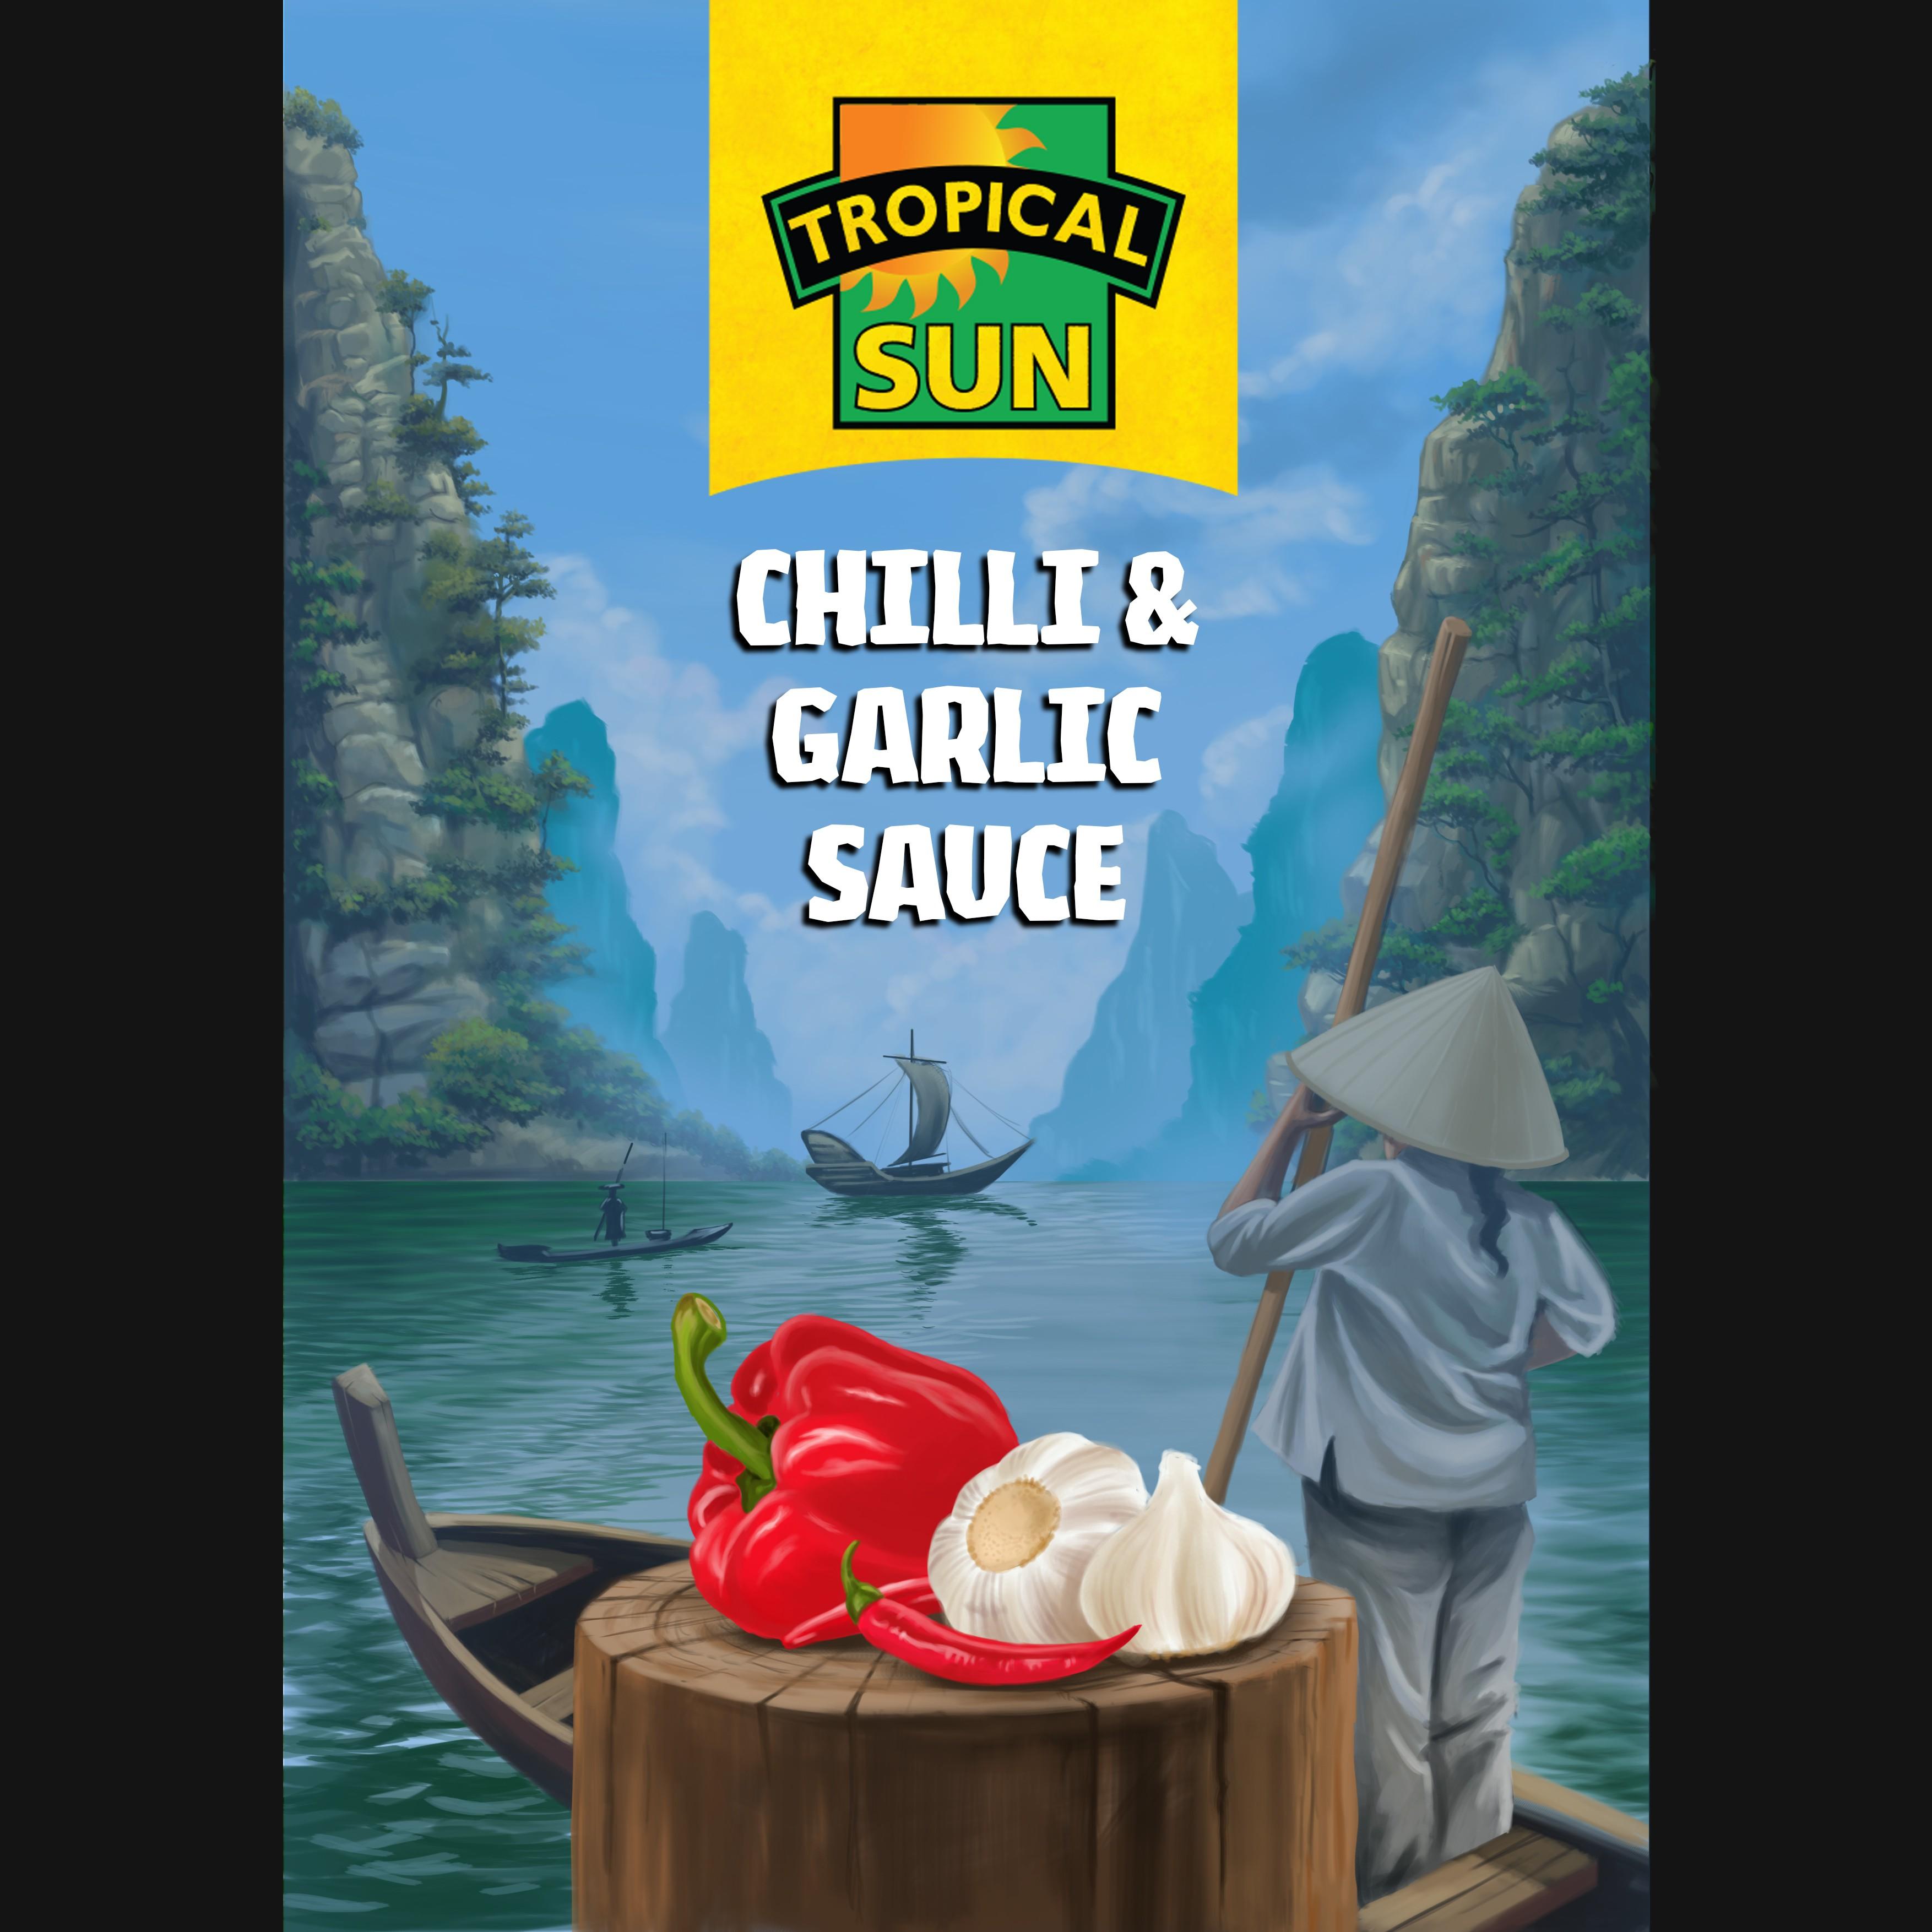 Tropical Sun Chilli & Garlic Sauce Label Digital Painting